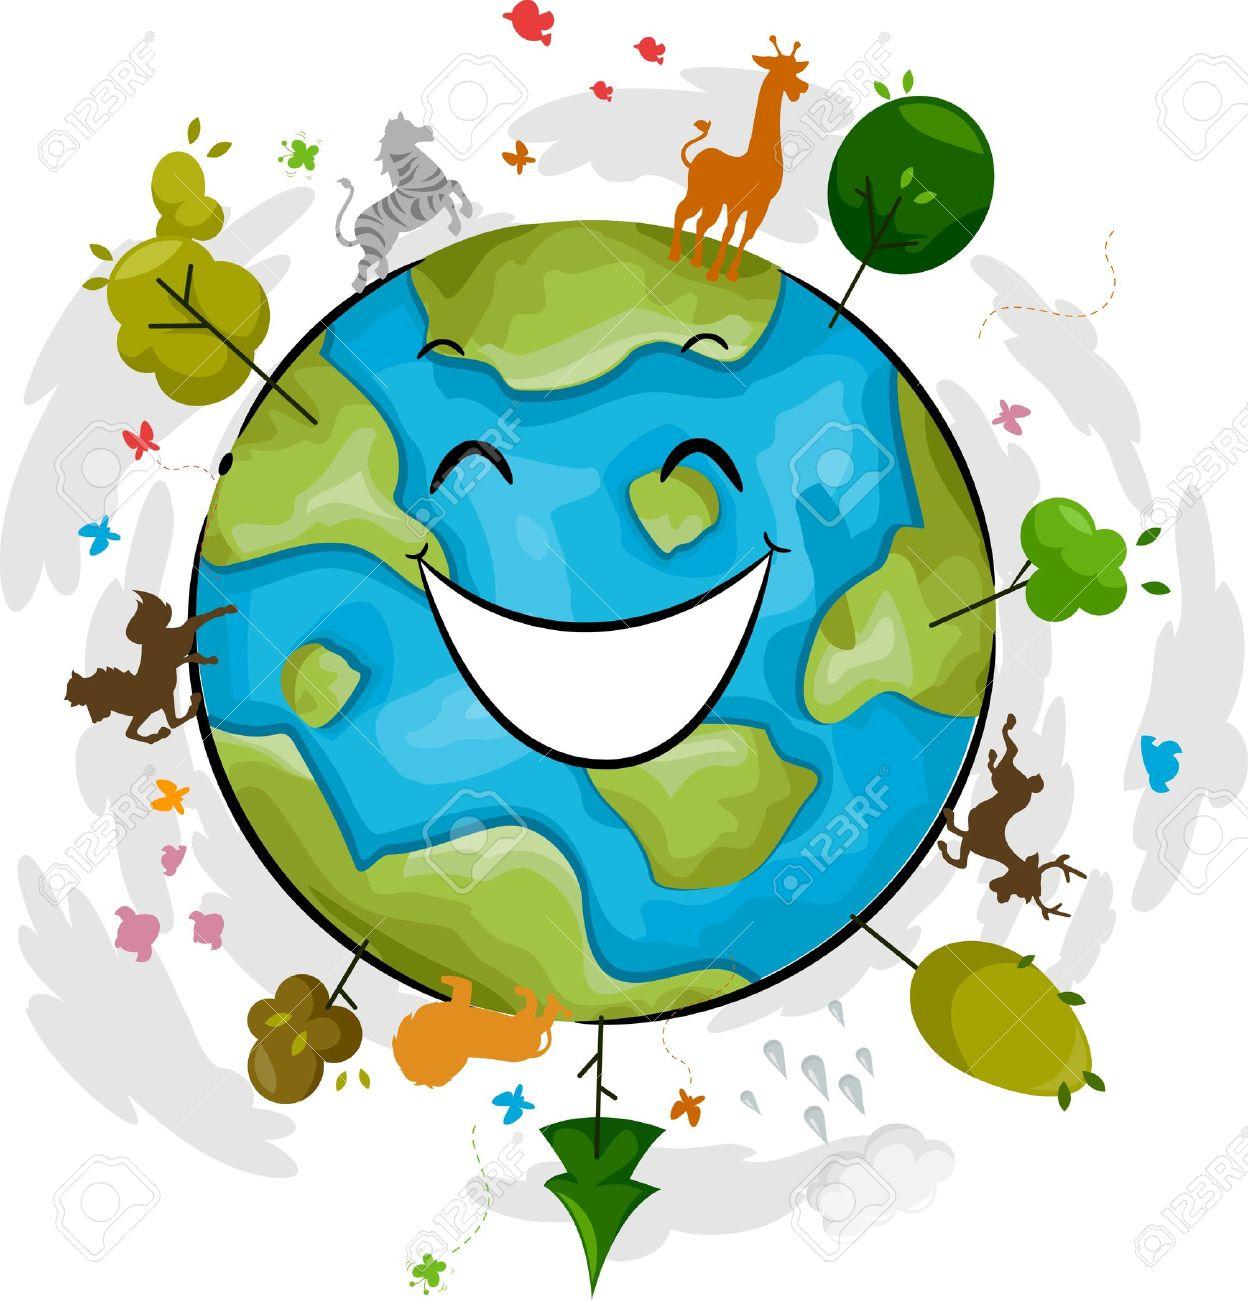 Illustration of a Happy Earth Mascot Stock Photo - 12575442